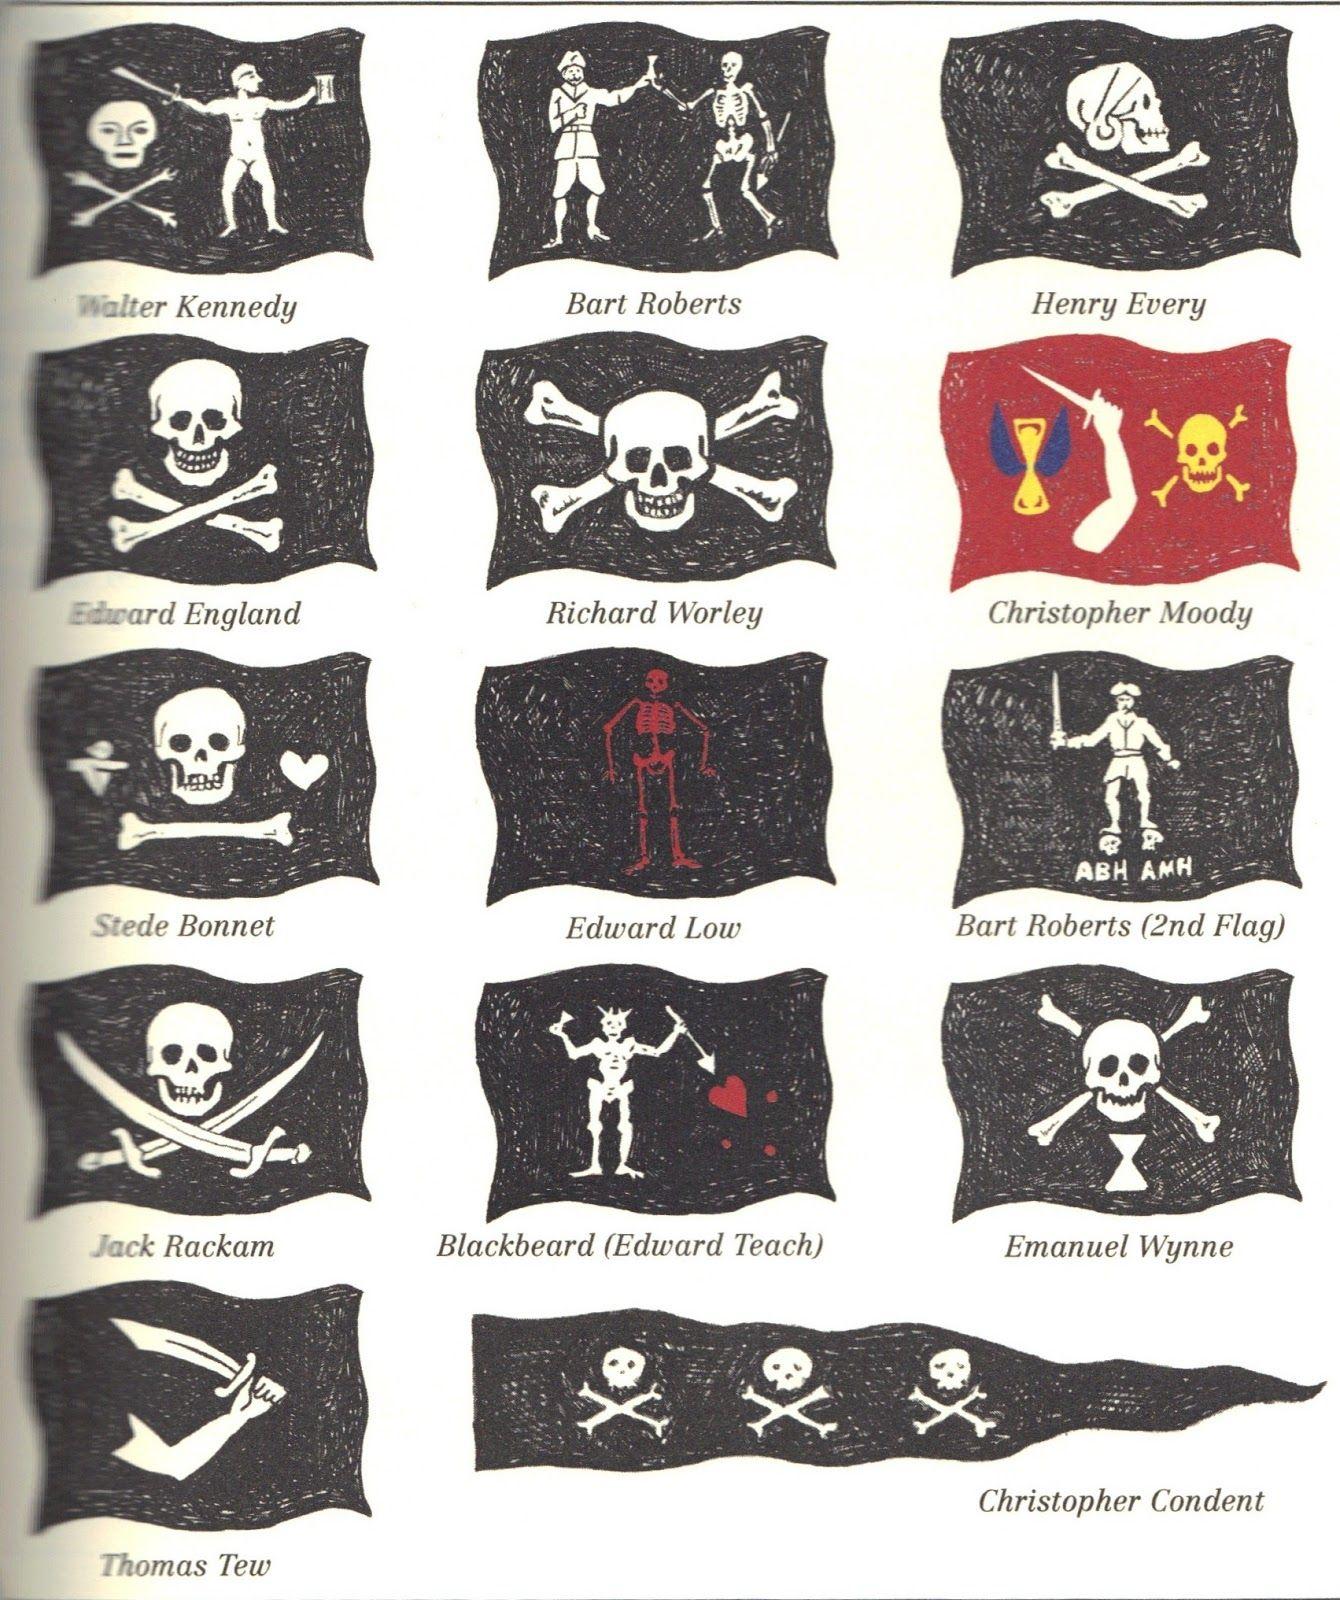 Pin by Lyttleton Callender on Symbols and Sigils